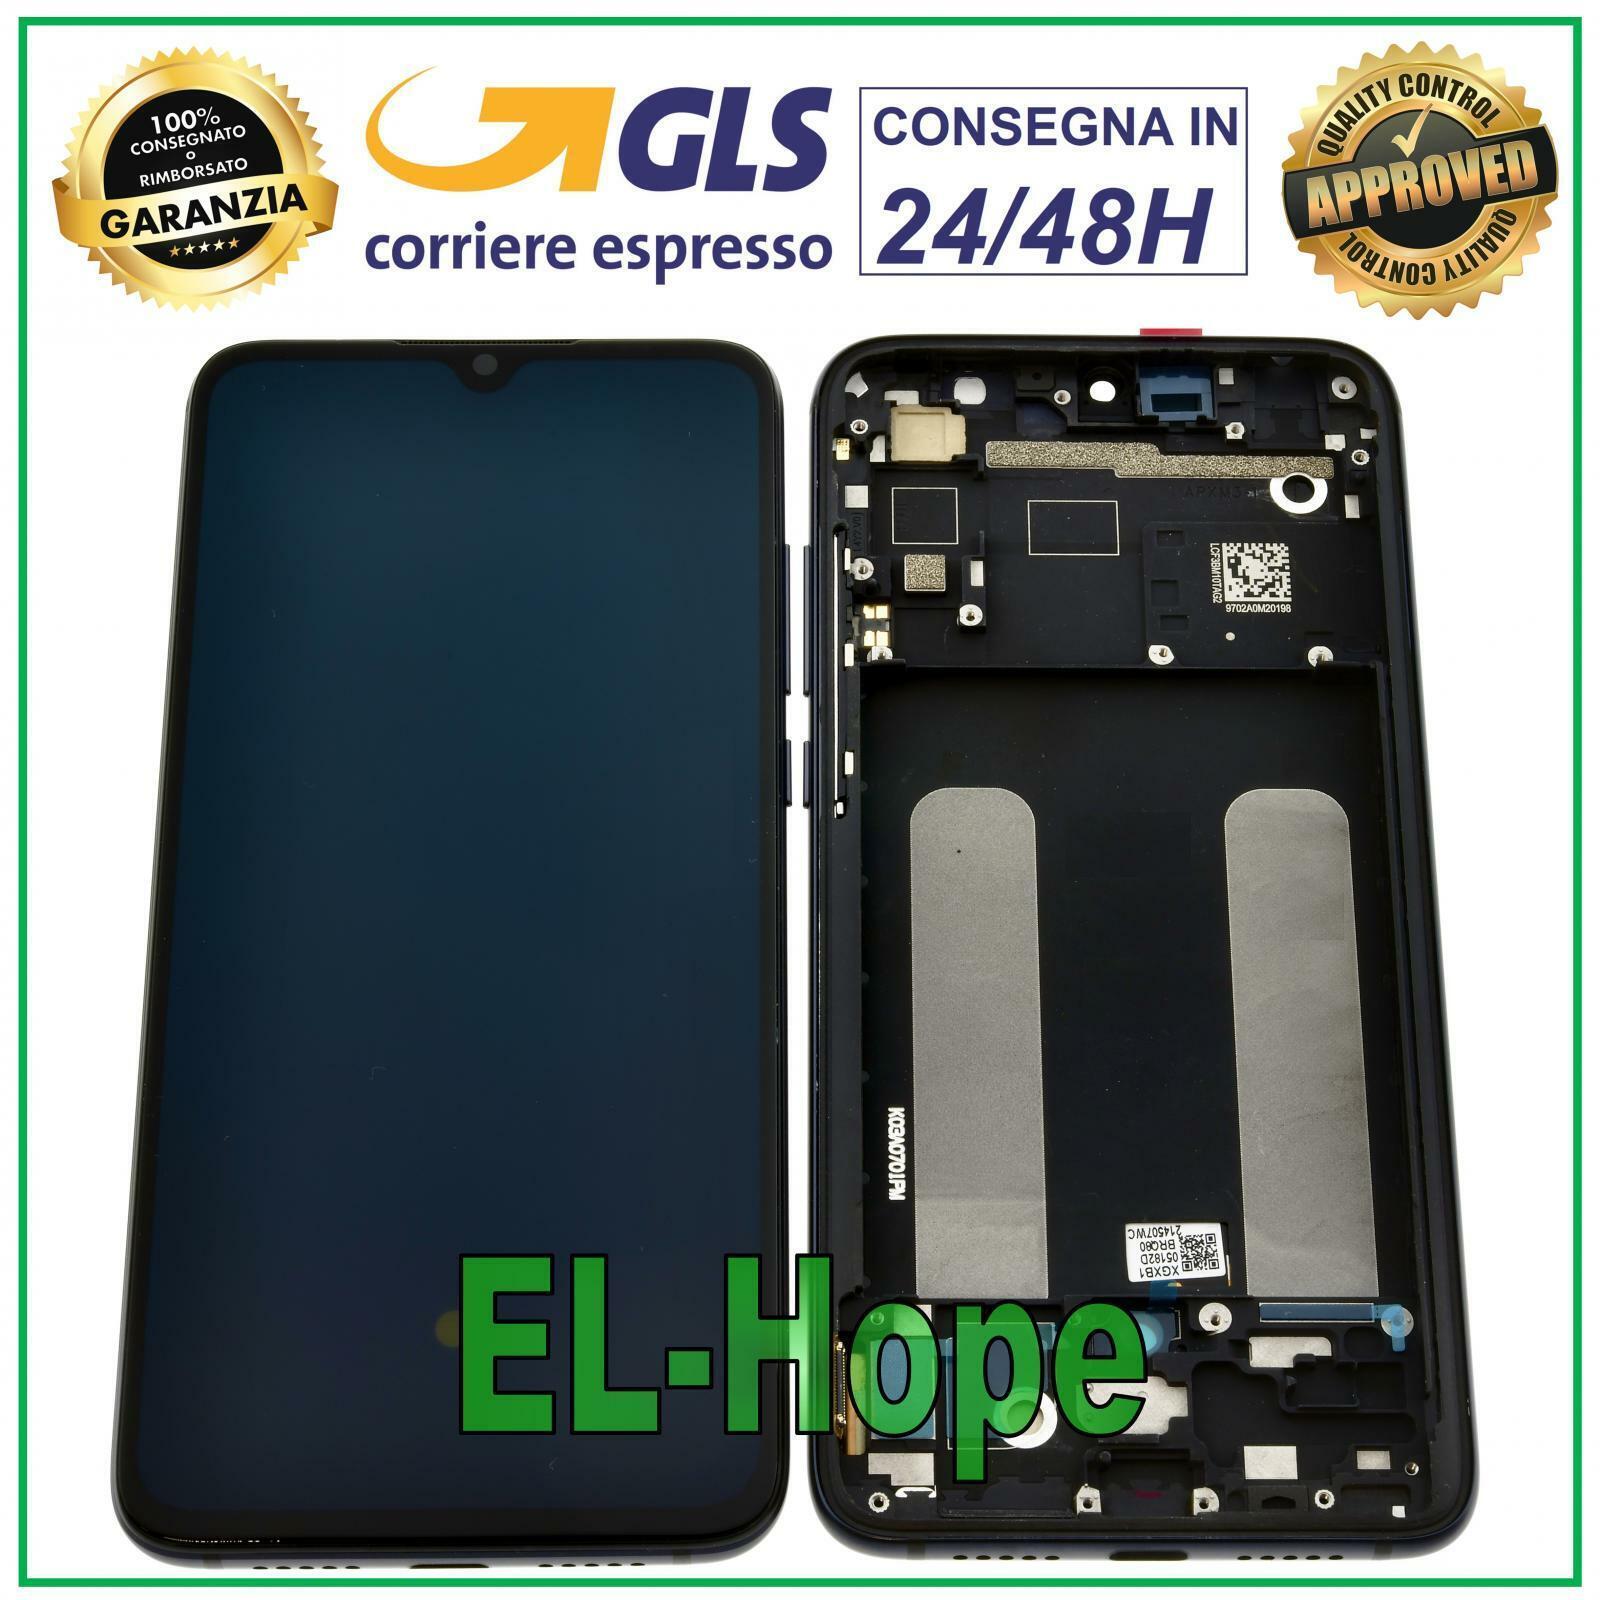 xiaomi: DISPLAY LCD OLED TOUCH SCREEN + FRAME PER XIAOMI MI 9 LITE M1904F3BG VETRO NERO